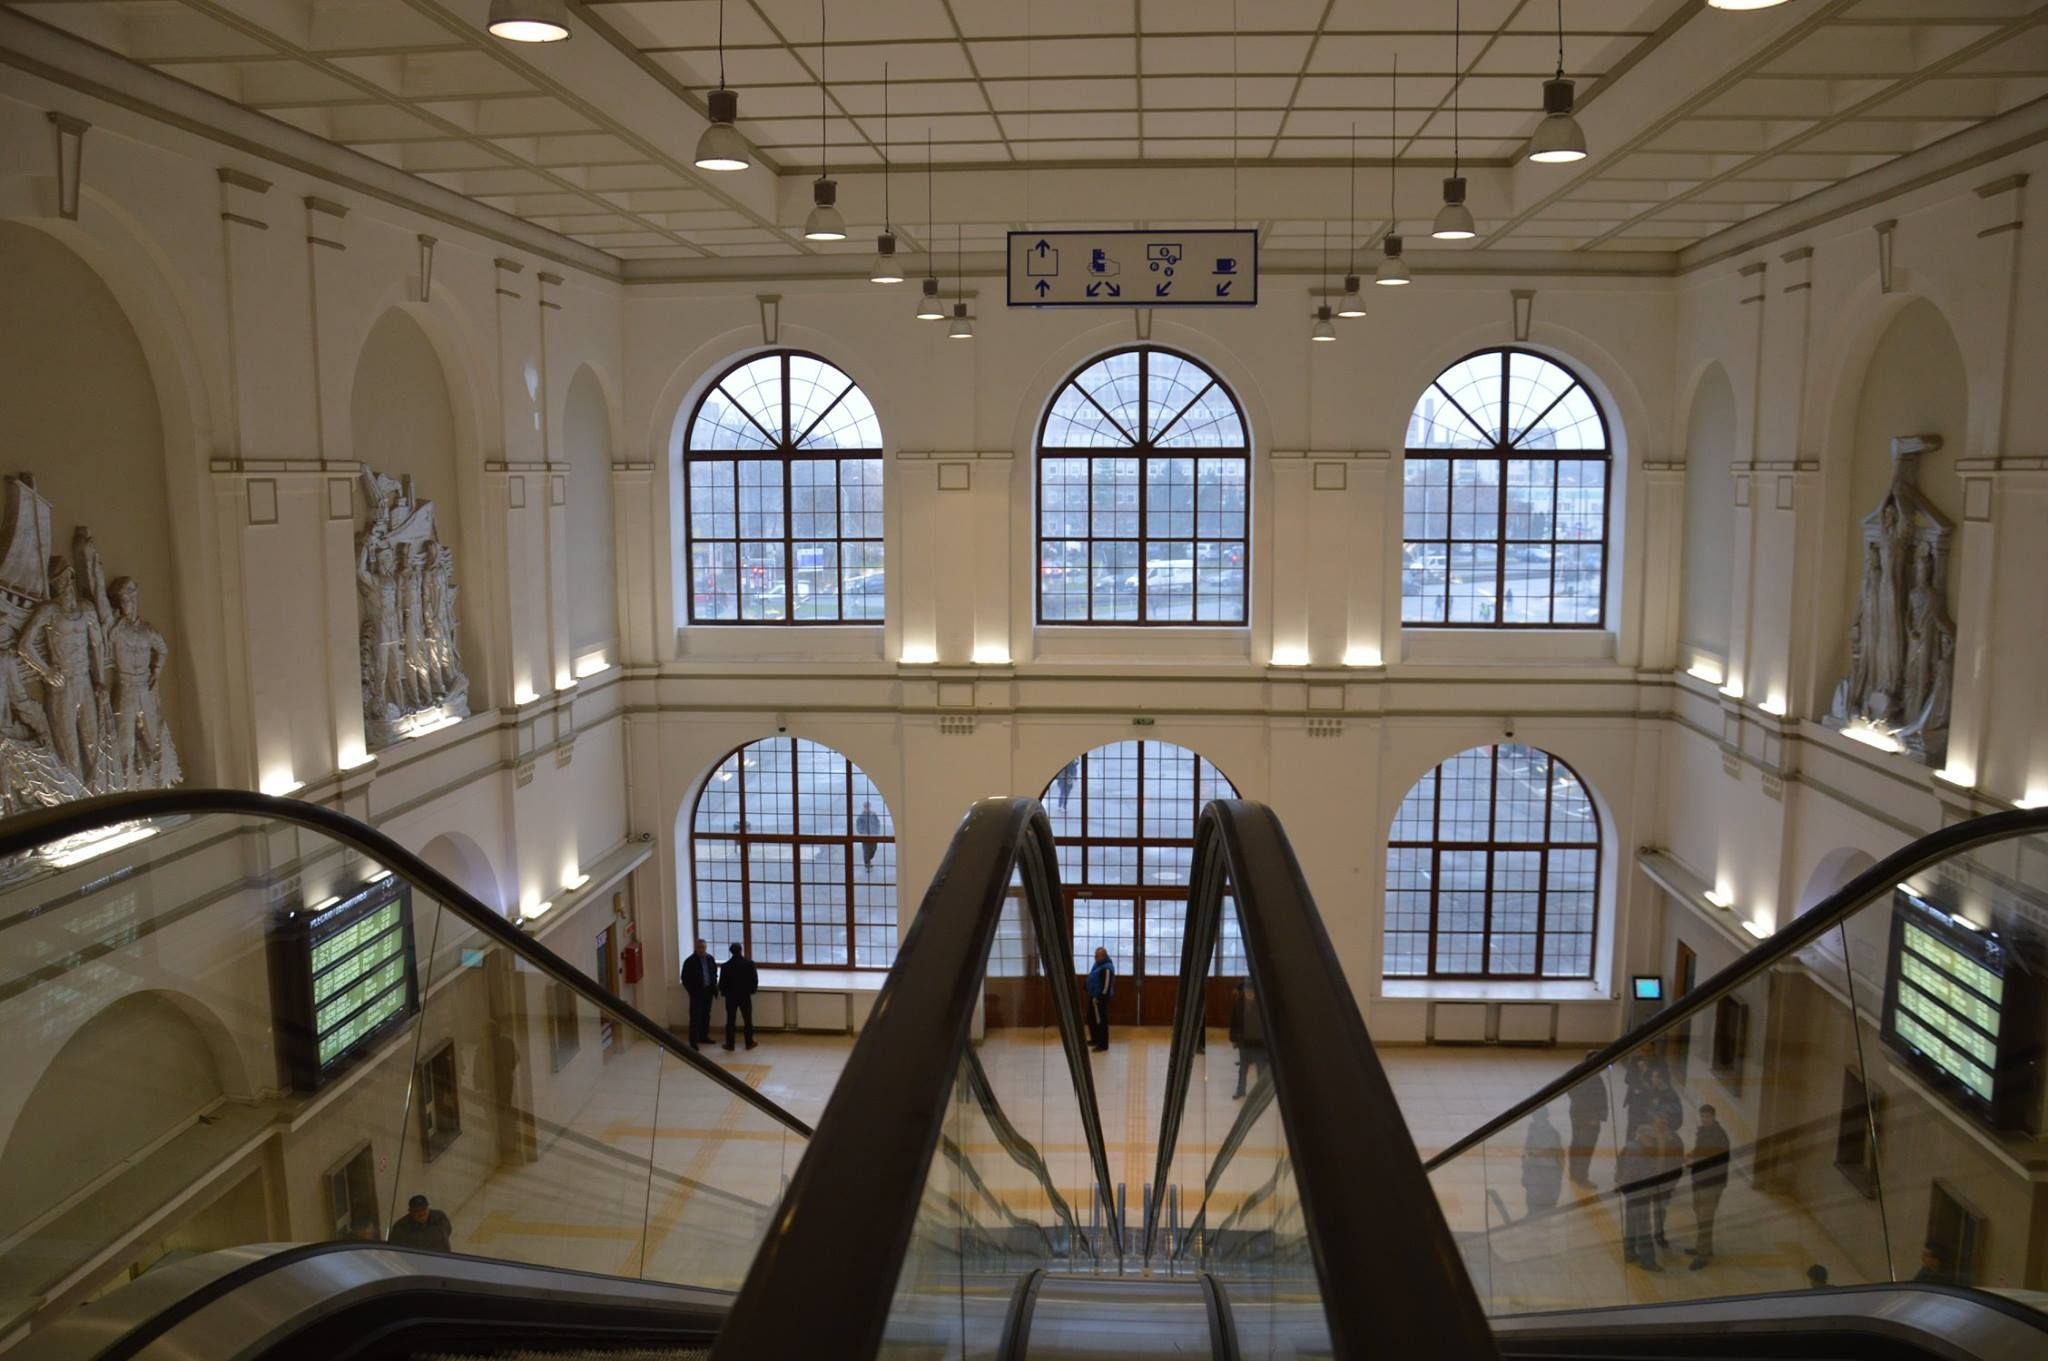 Gara din Arad, cae mai modernă din România / Sursa foto: www.skyscrapercity.com / forum.peundemerg.ro